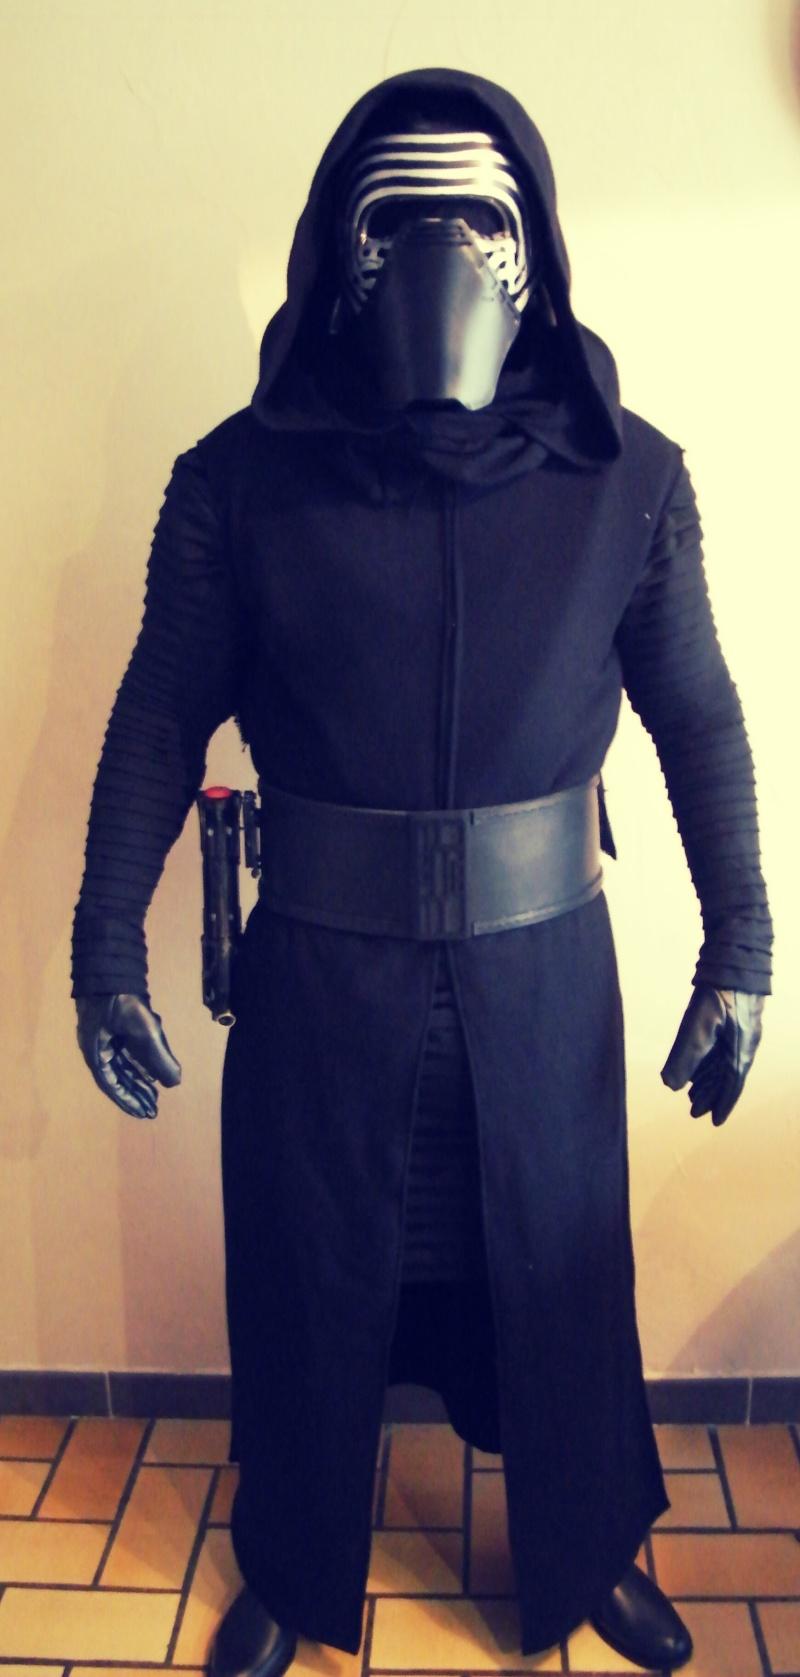 Kylo Ren cosplay The Force Awakens by Magik Photos10